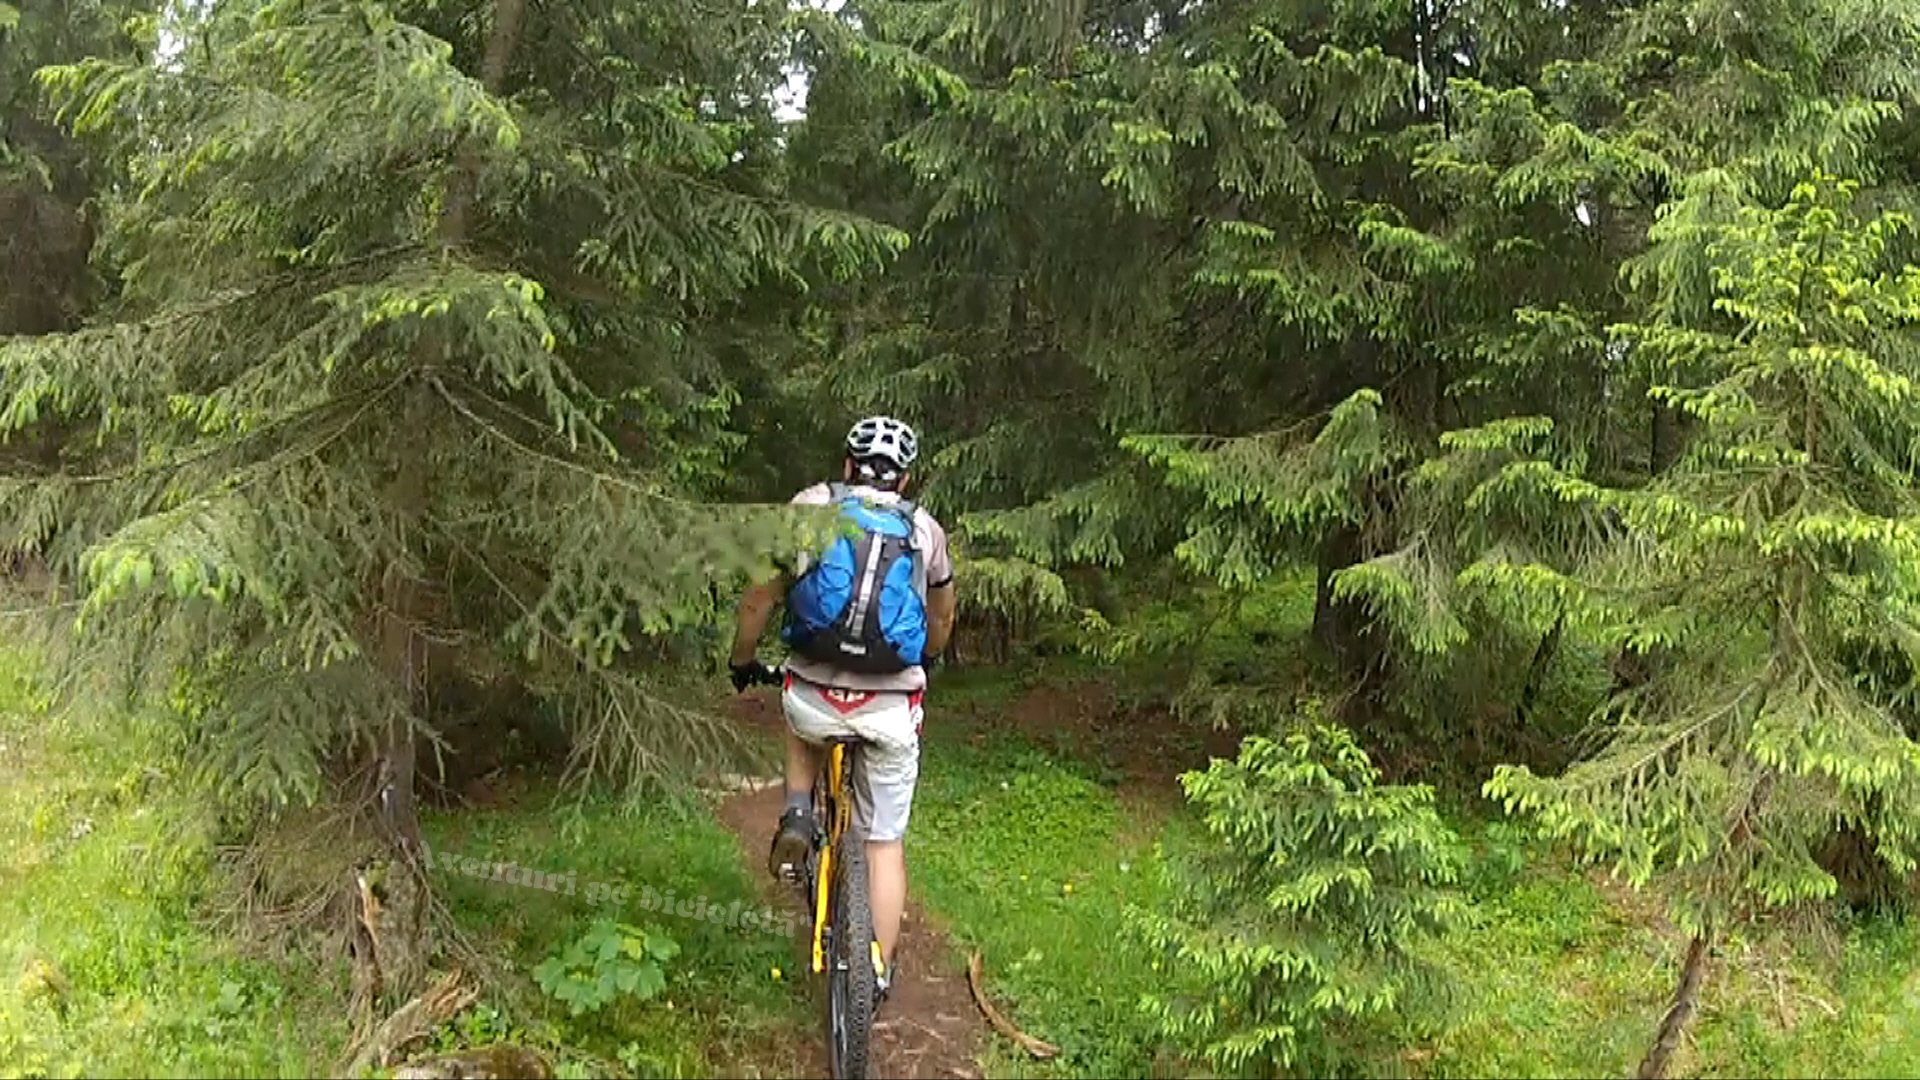 Prin Parcul Natural Apuseni pe traseul Padis – Glavoi – Sudrigiu